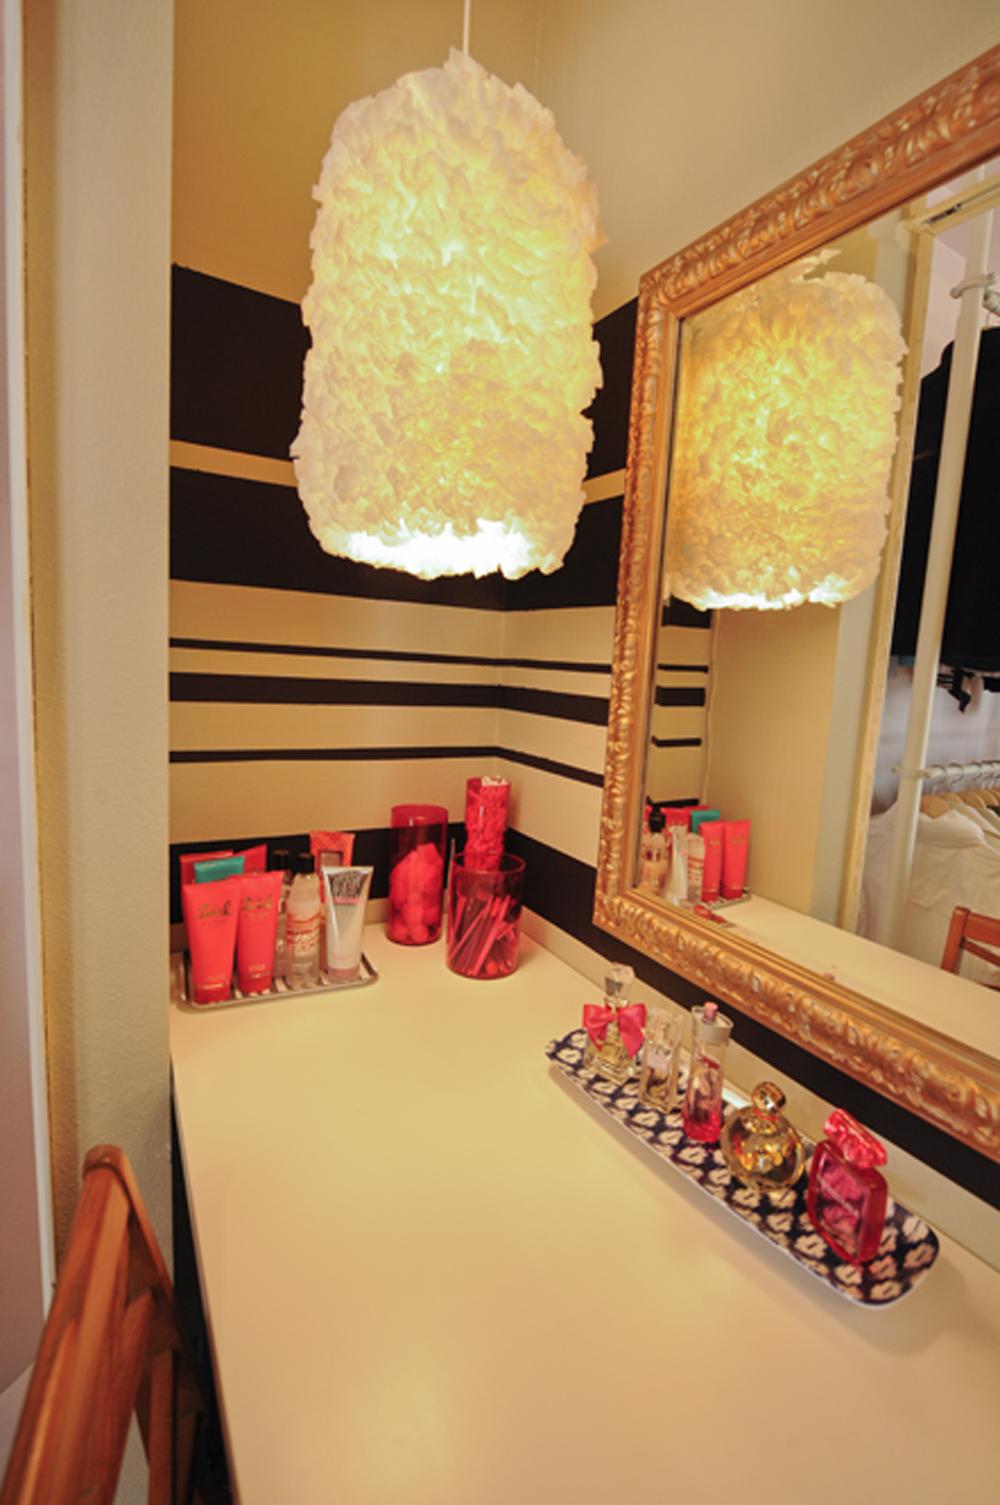 4 Light Bathroom Vanity Light